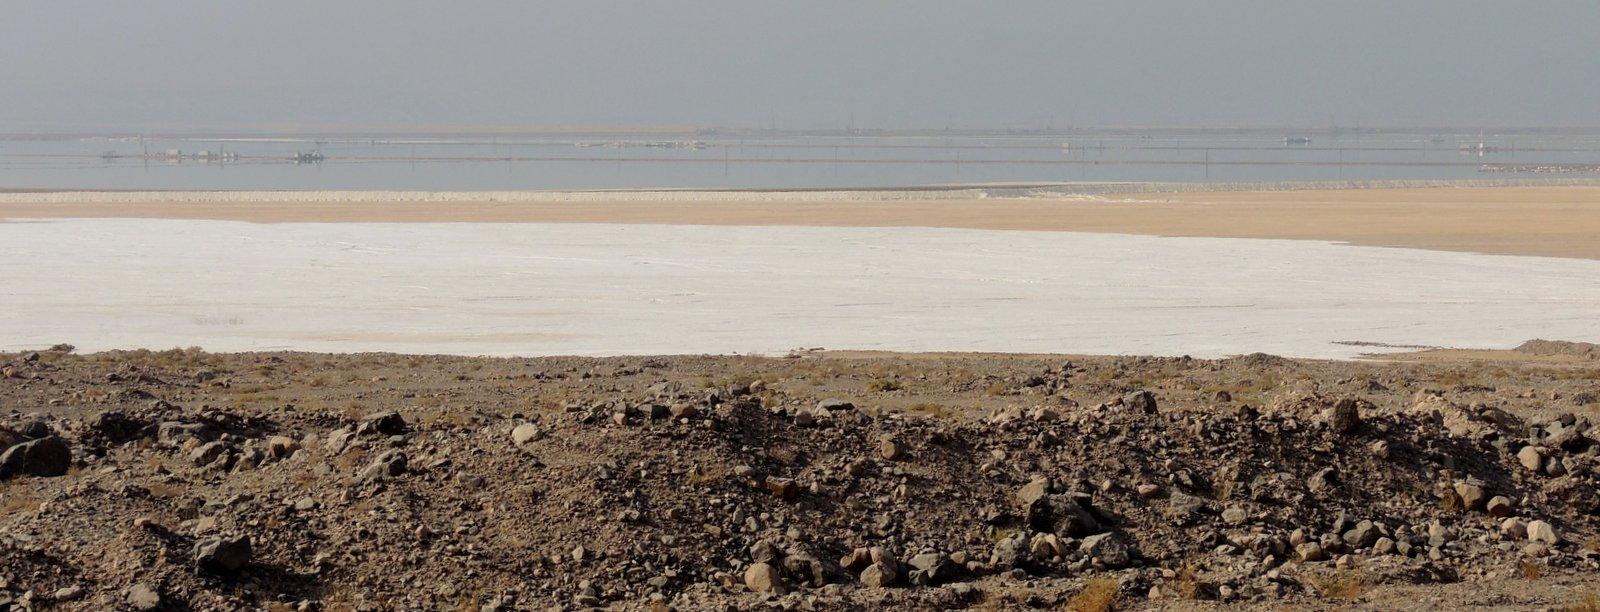 Salzpfanne am Toten Meer in Jordanien